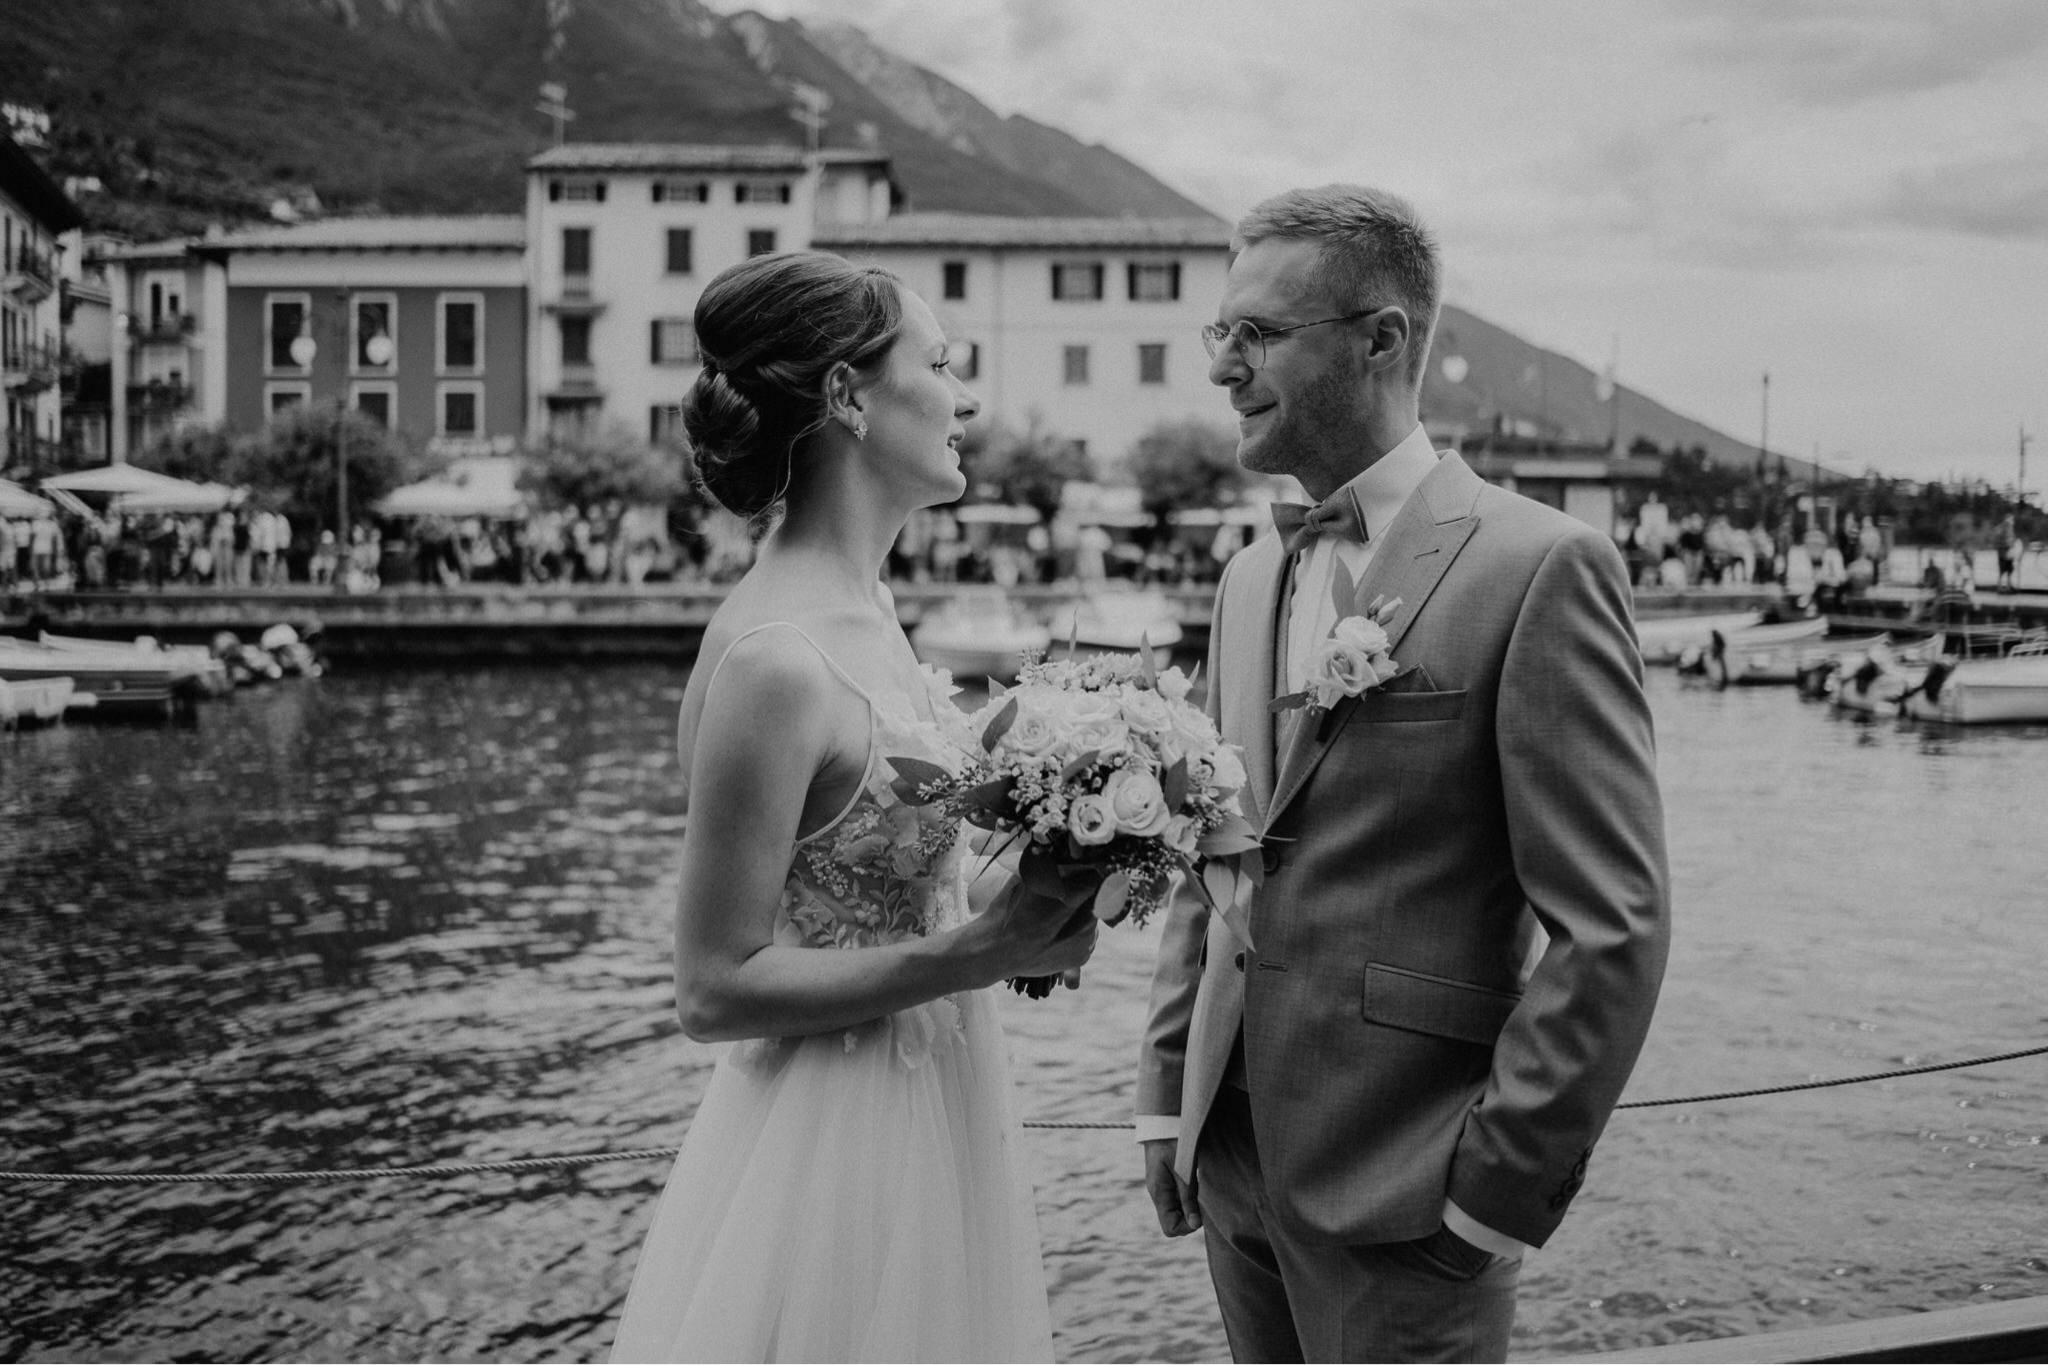 20 la 02 bootsfahrt 1085 weddinphotographer Hochzeitsfotograf newzealand hamilton Weddingphotography Stuttgart